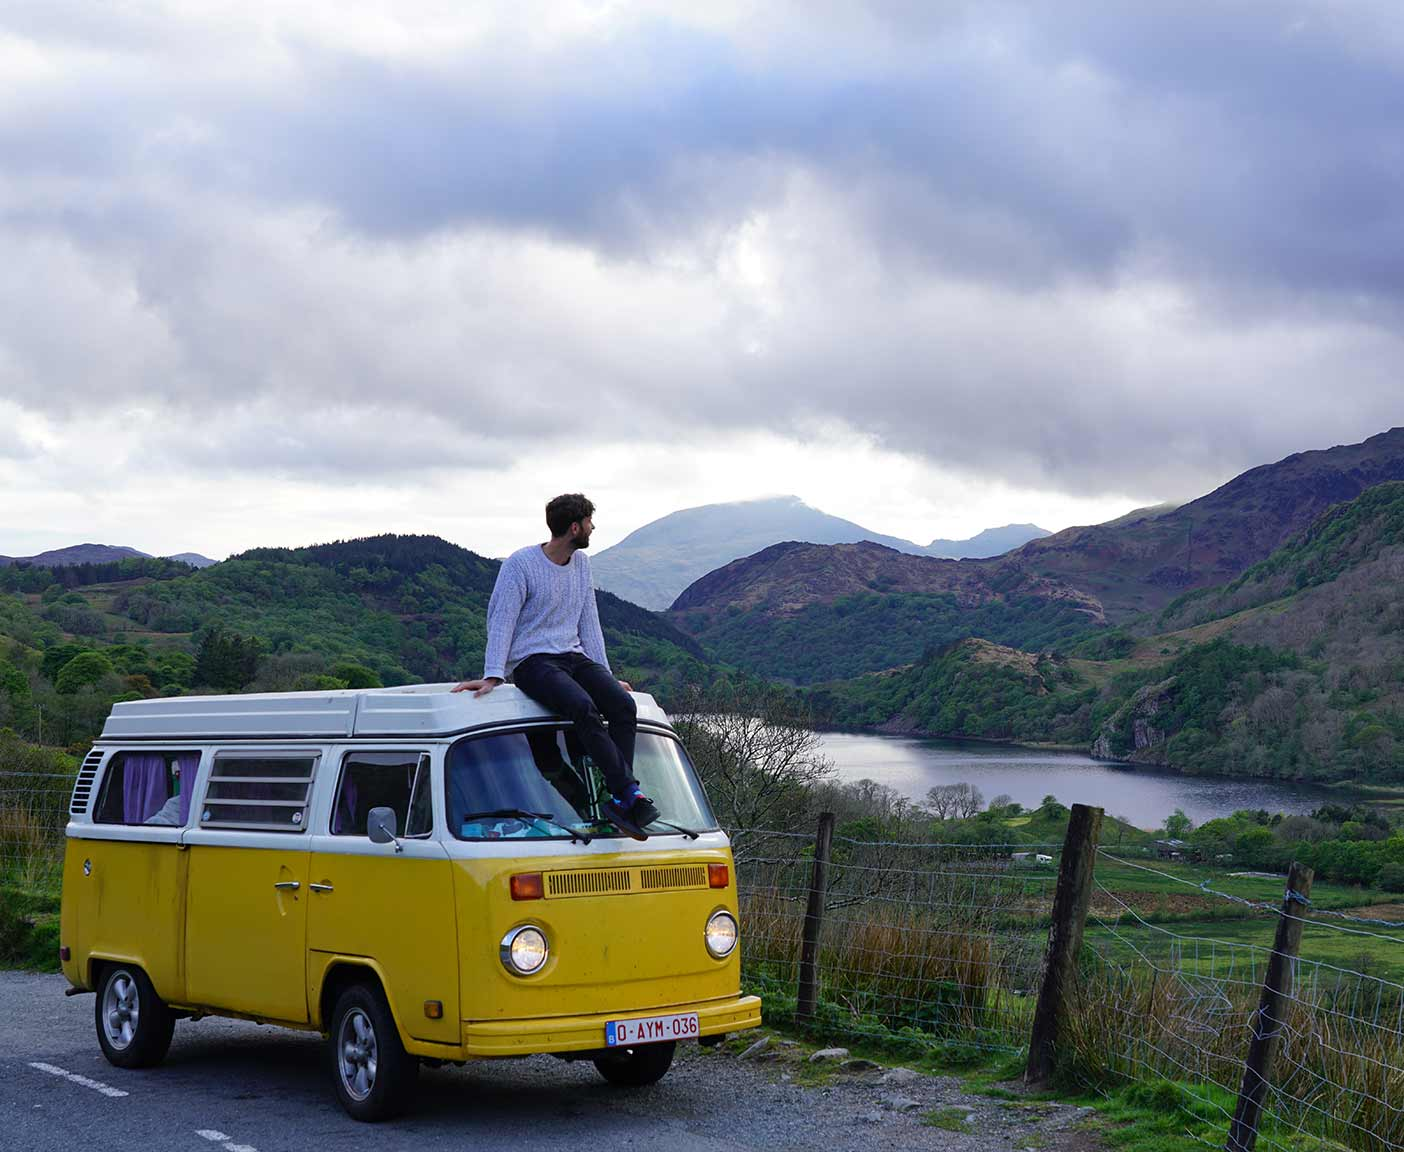 wohnmobil-wales-nach-womo-reise-england-camper-reisebericht-12